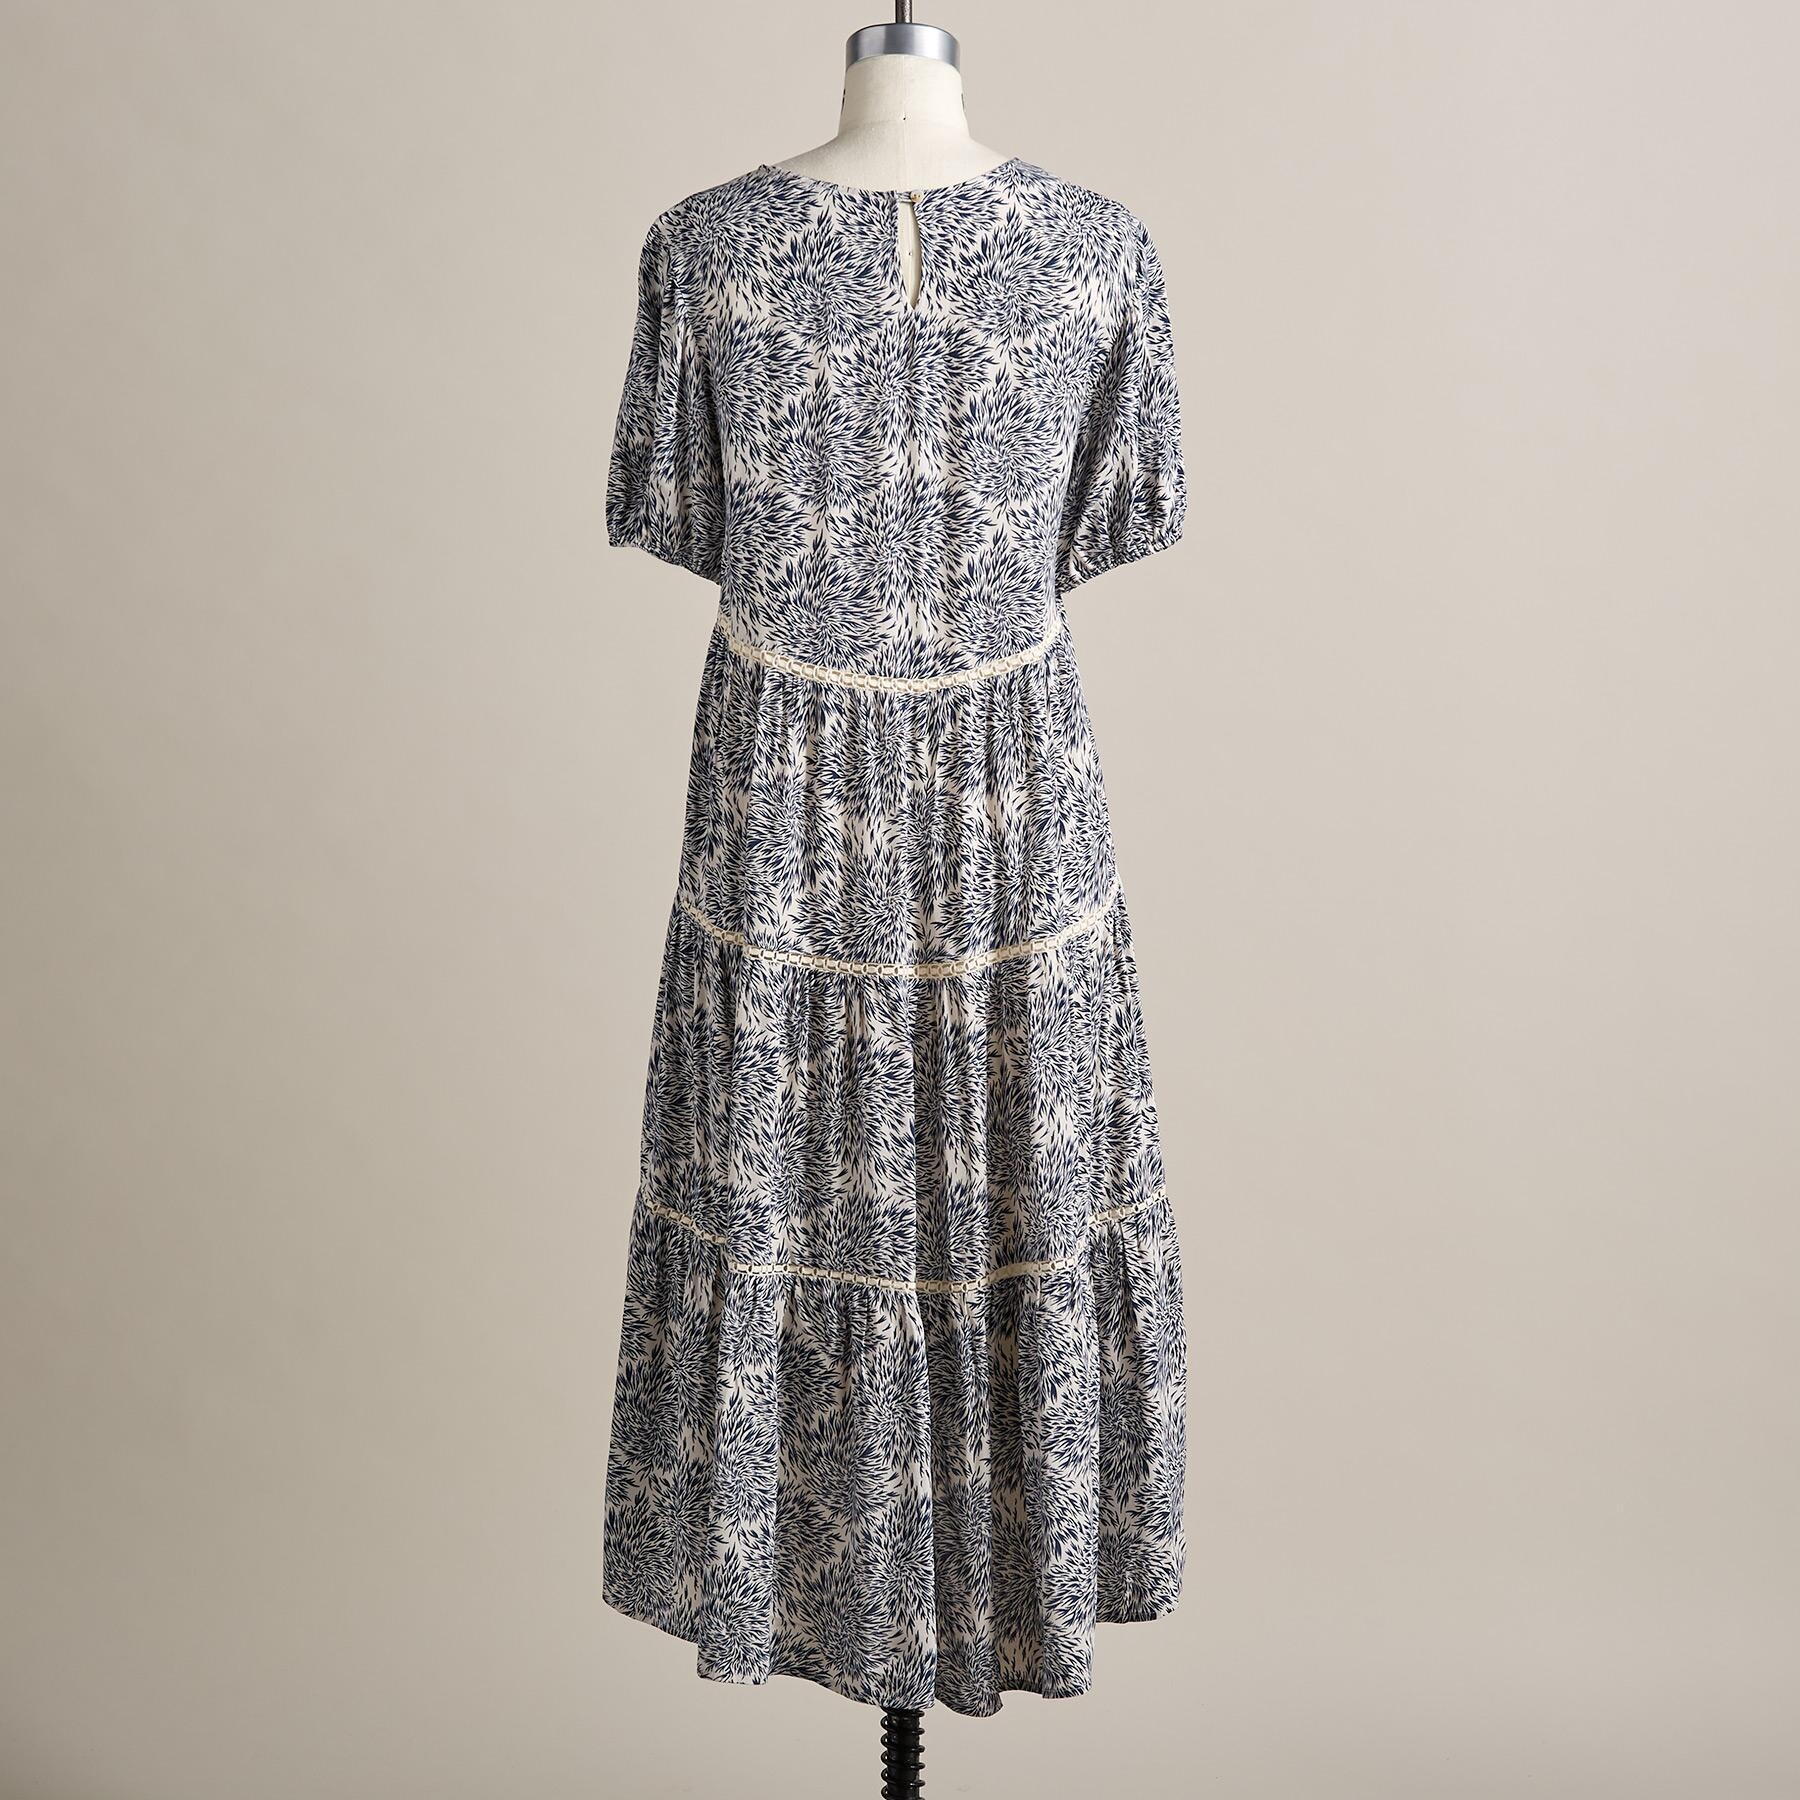 MY MATILDA DRESS: View 2